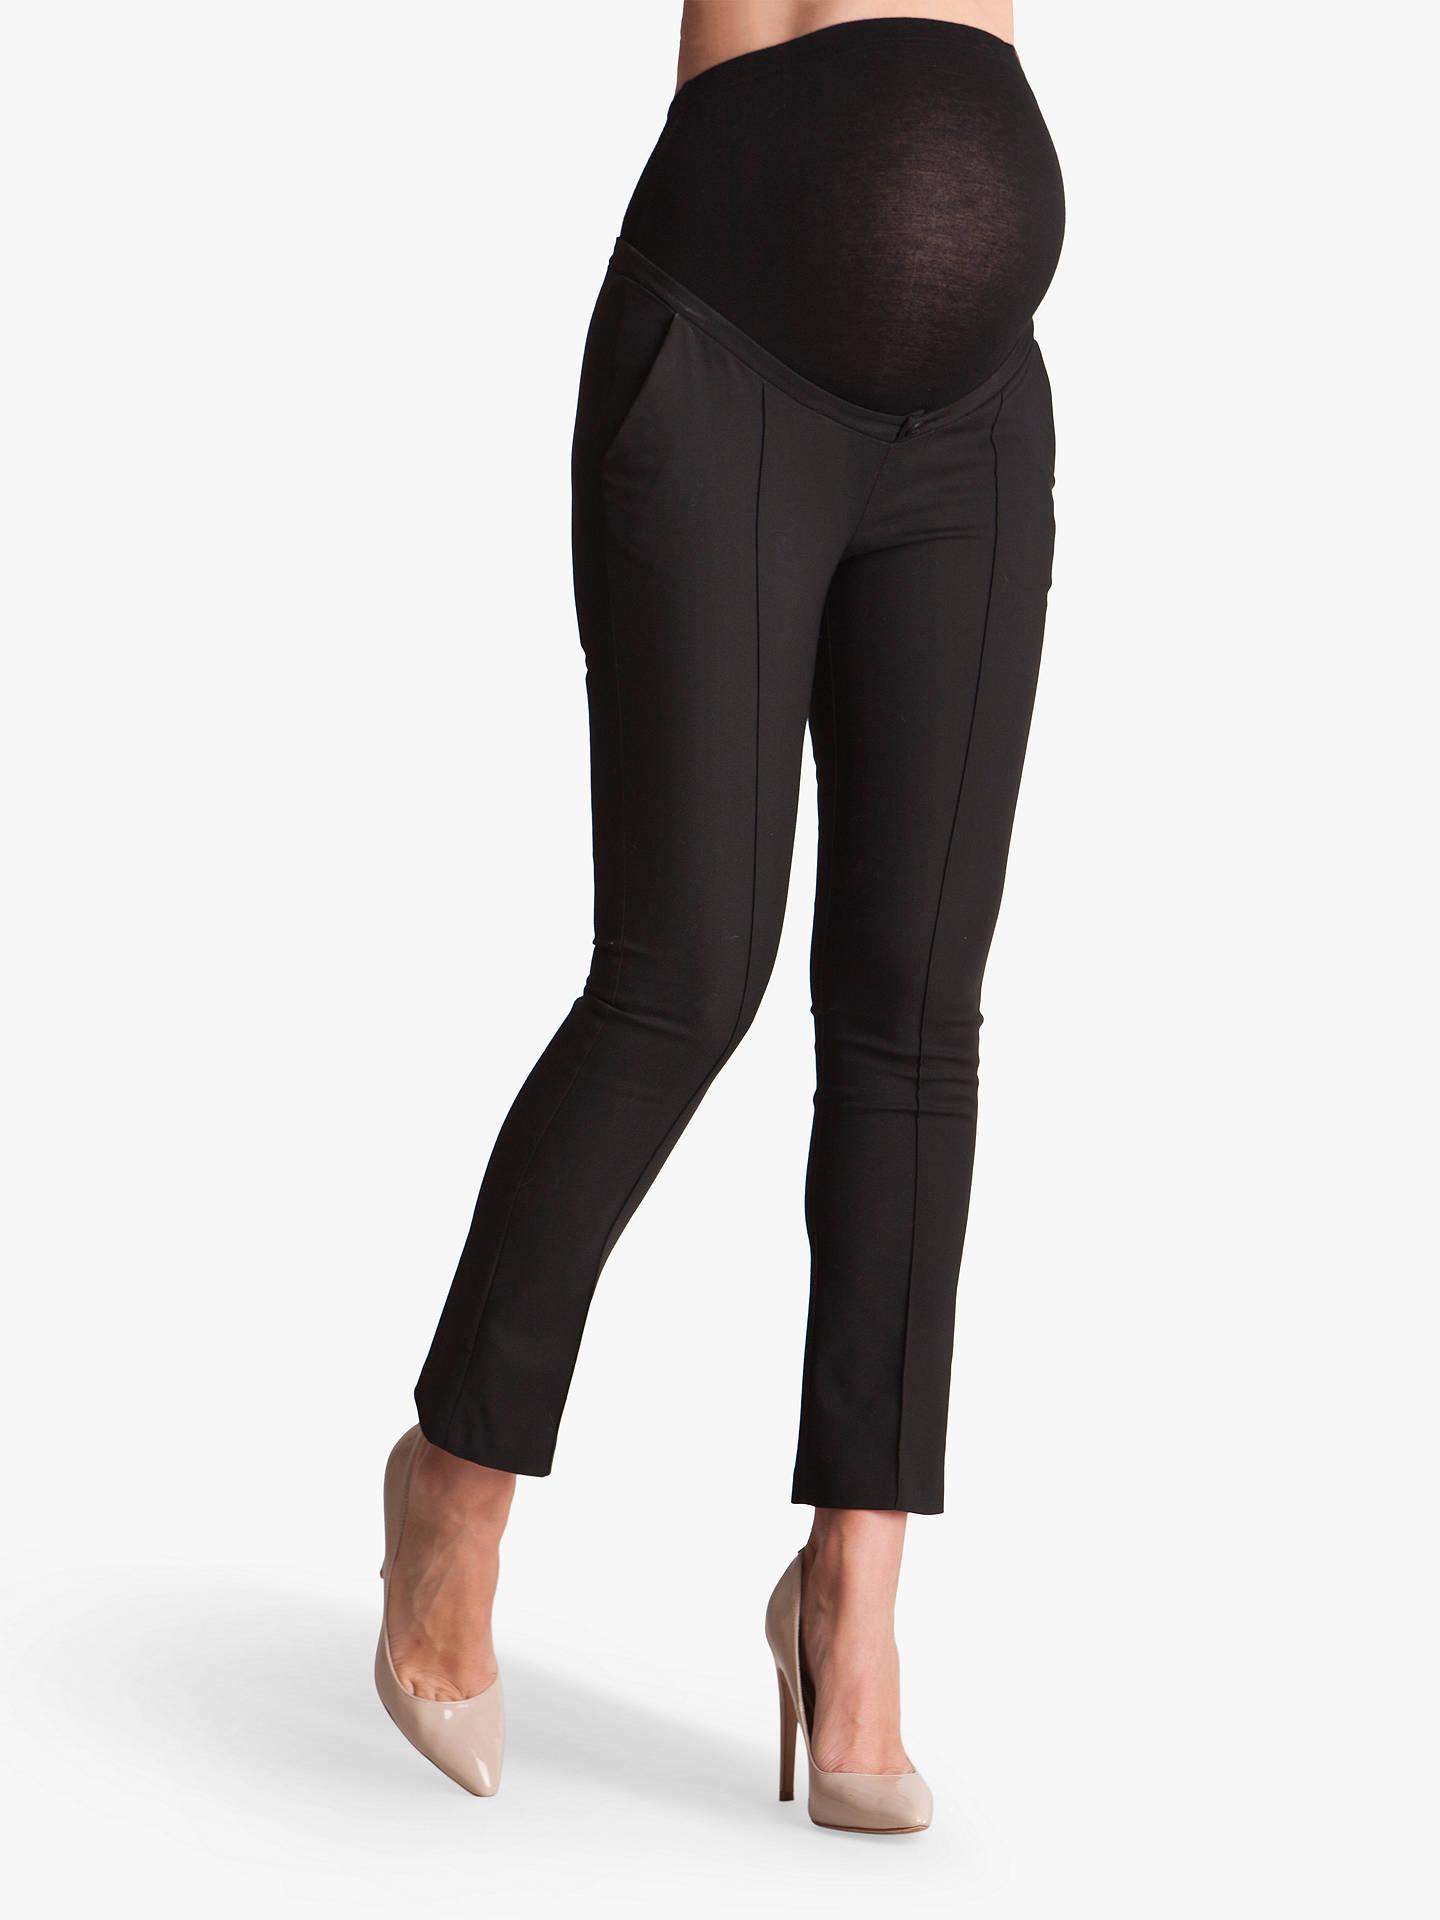 46f66228790 Séraphine Cressida Maternity Trousers, Black